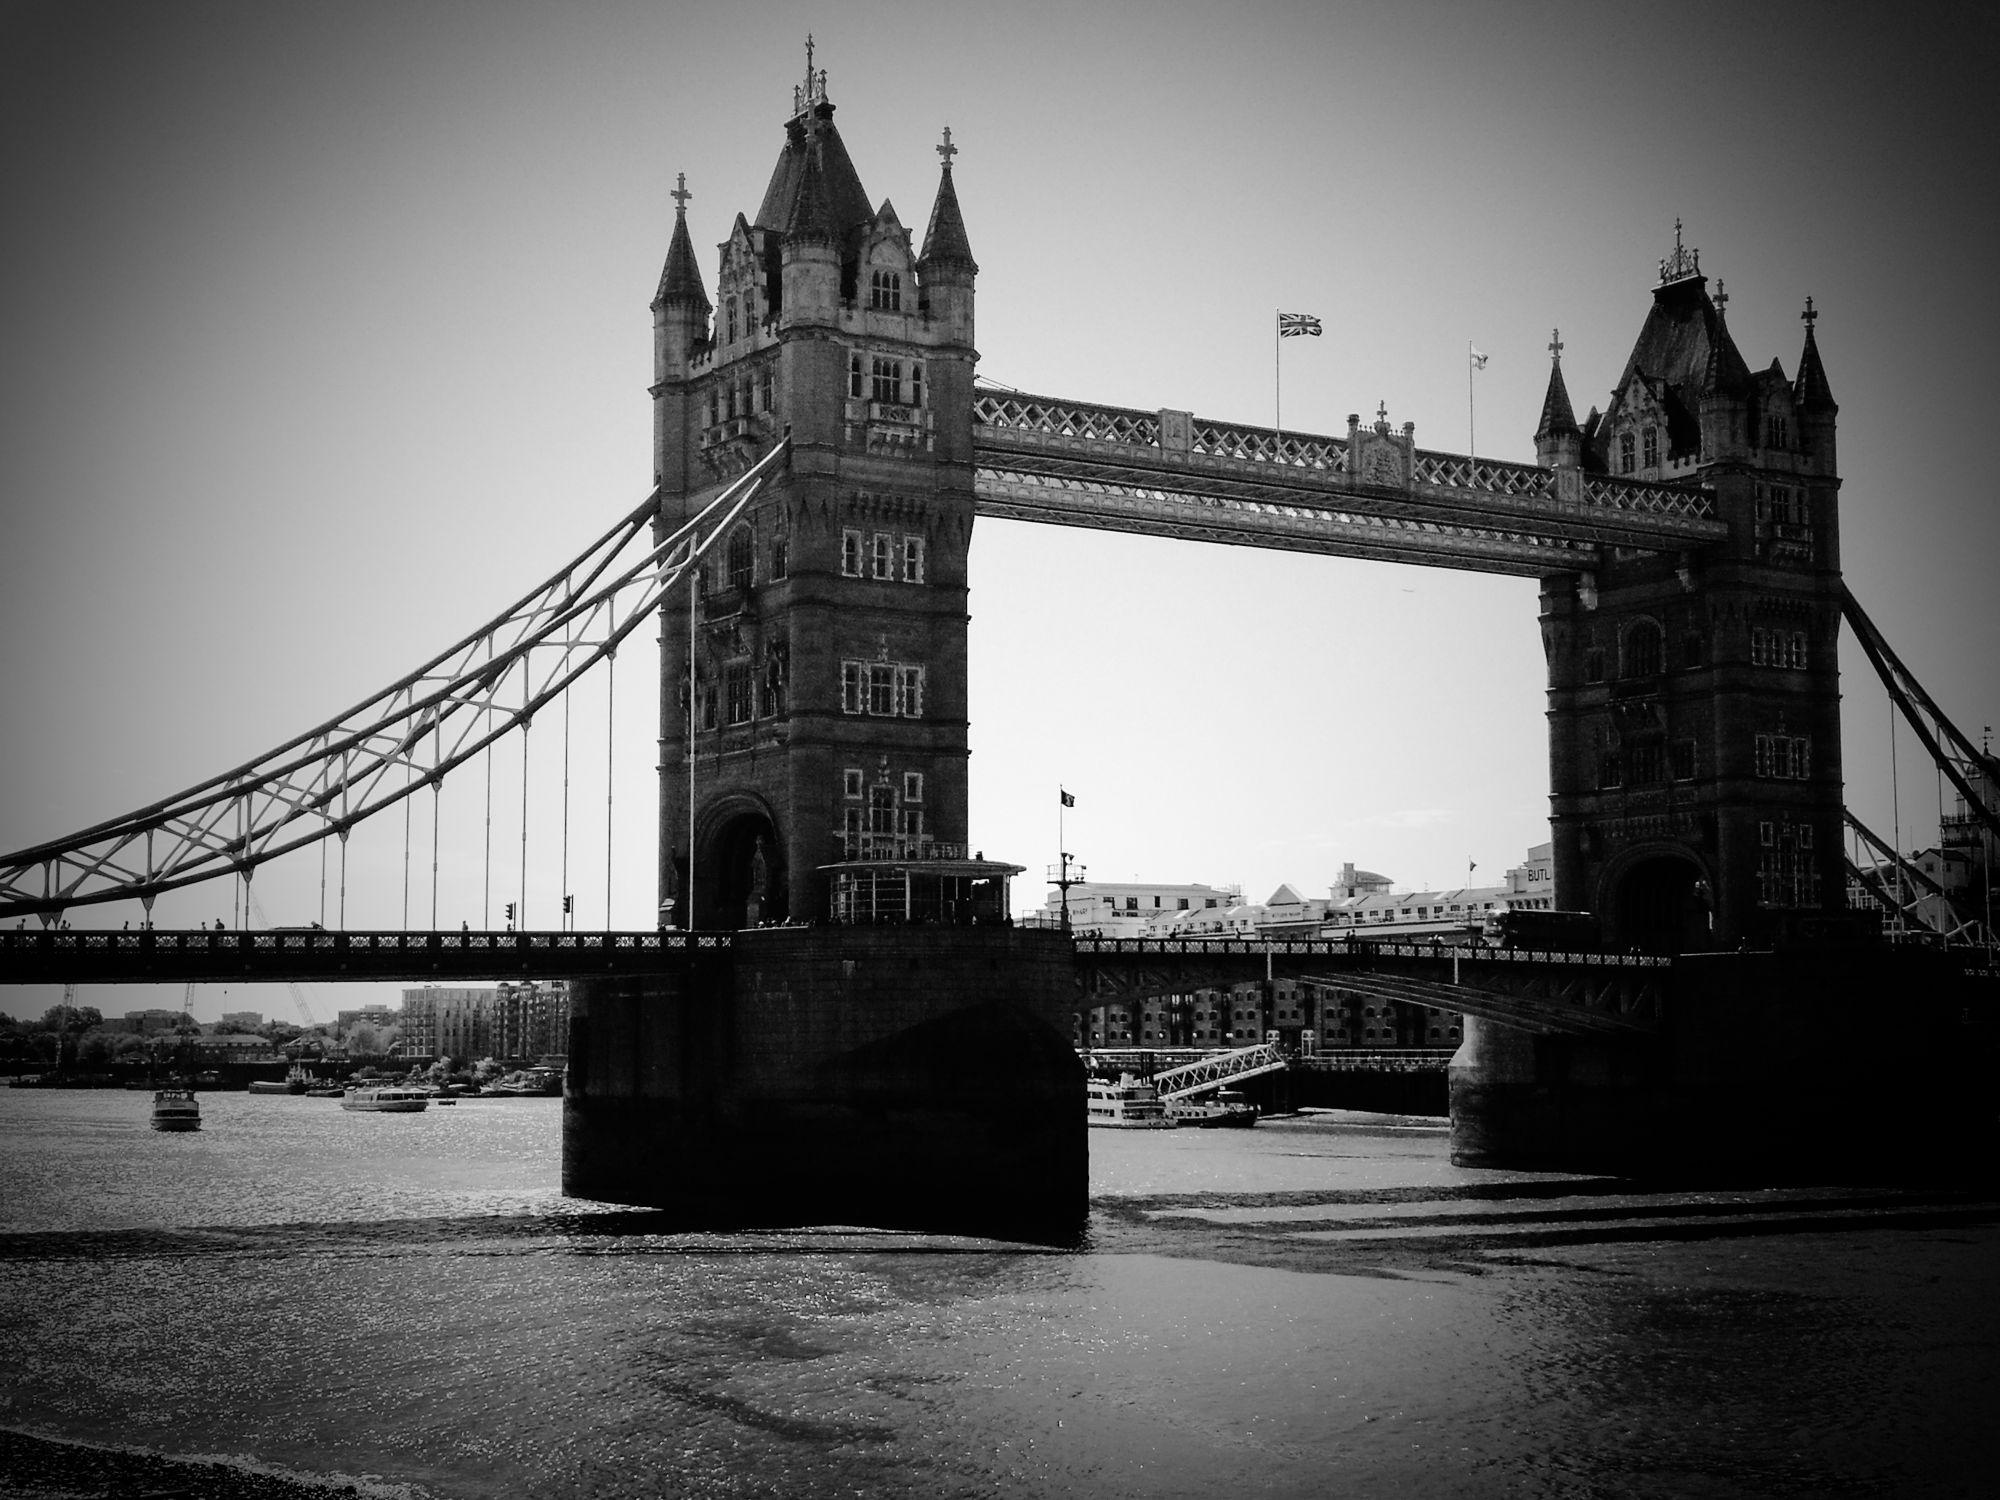 Tower Bridge, London - Londres, Angleterre